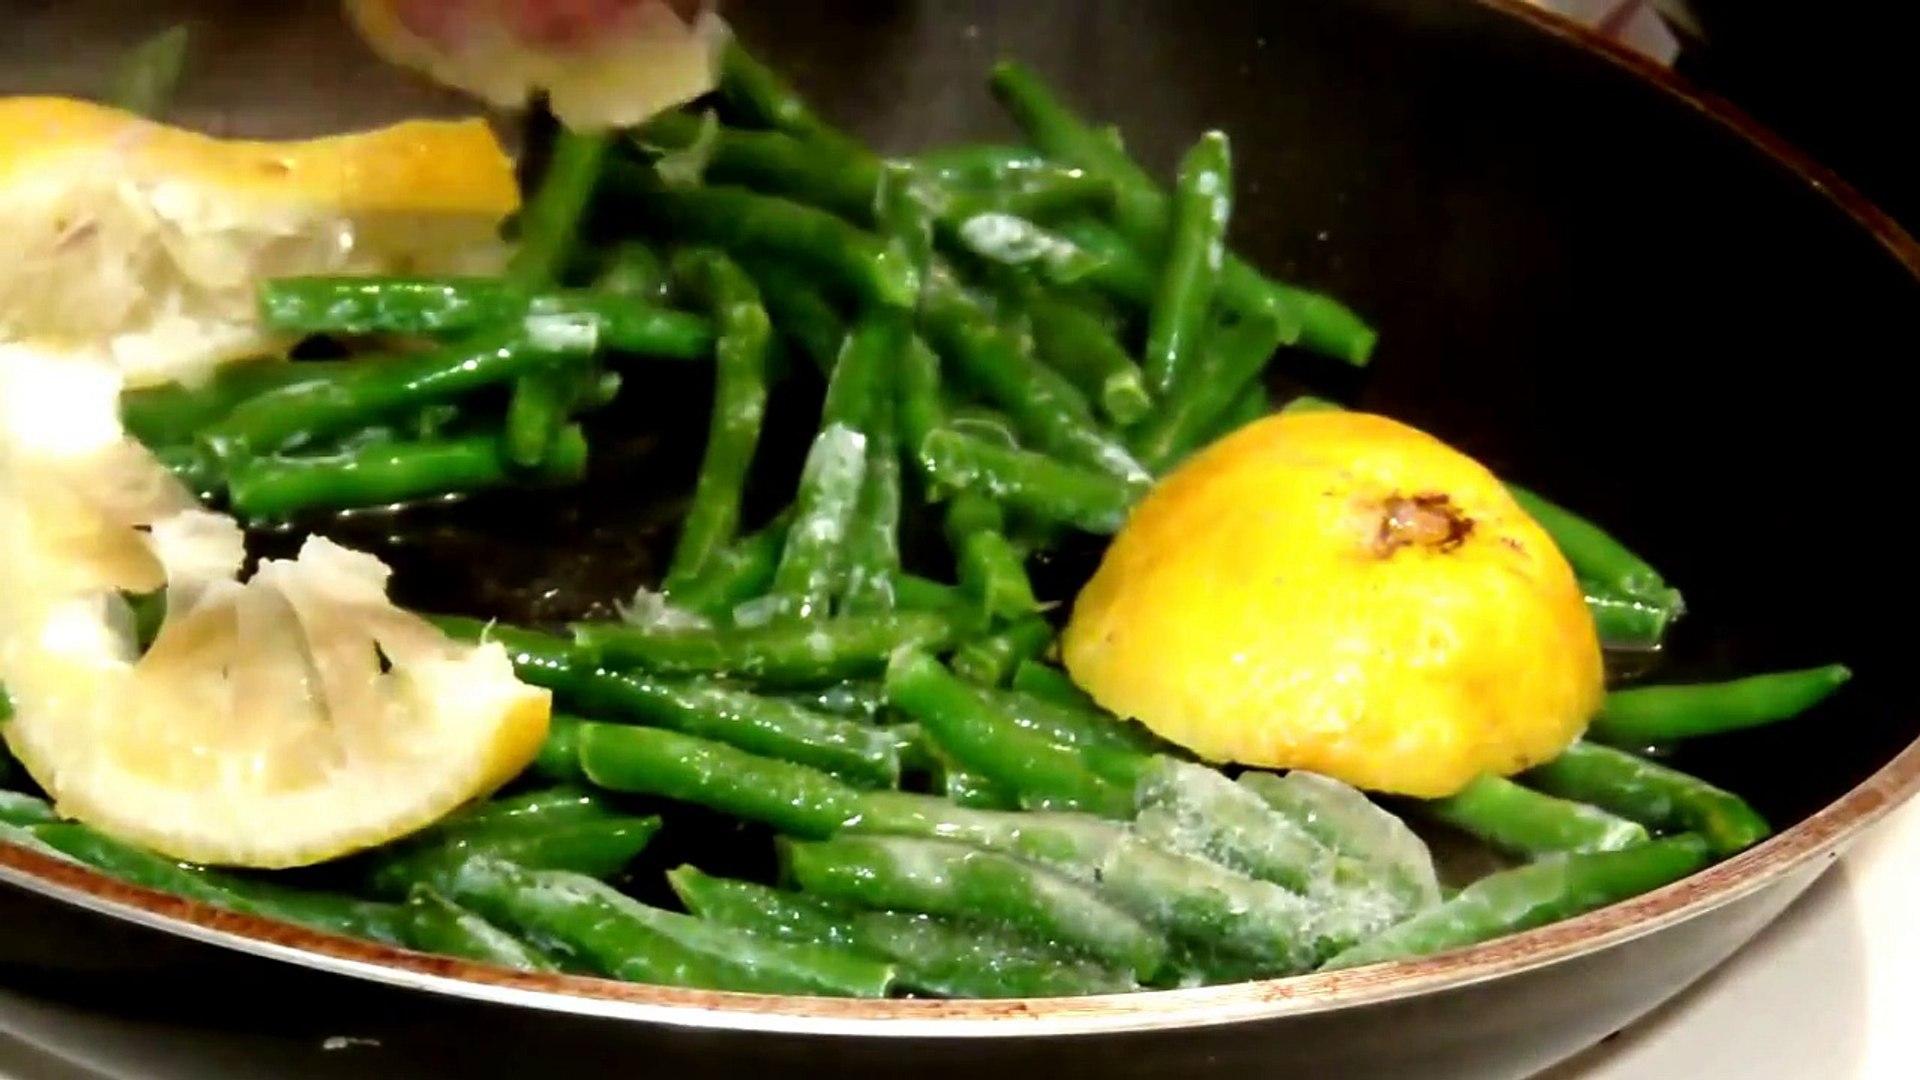 Healthy And Quick Dinner Recipe | Garlic Lemon Shrimp And Green Beans Recipe | Lemon Recipe